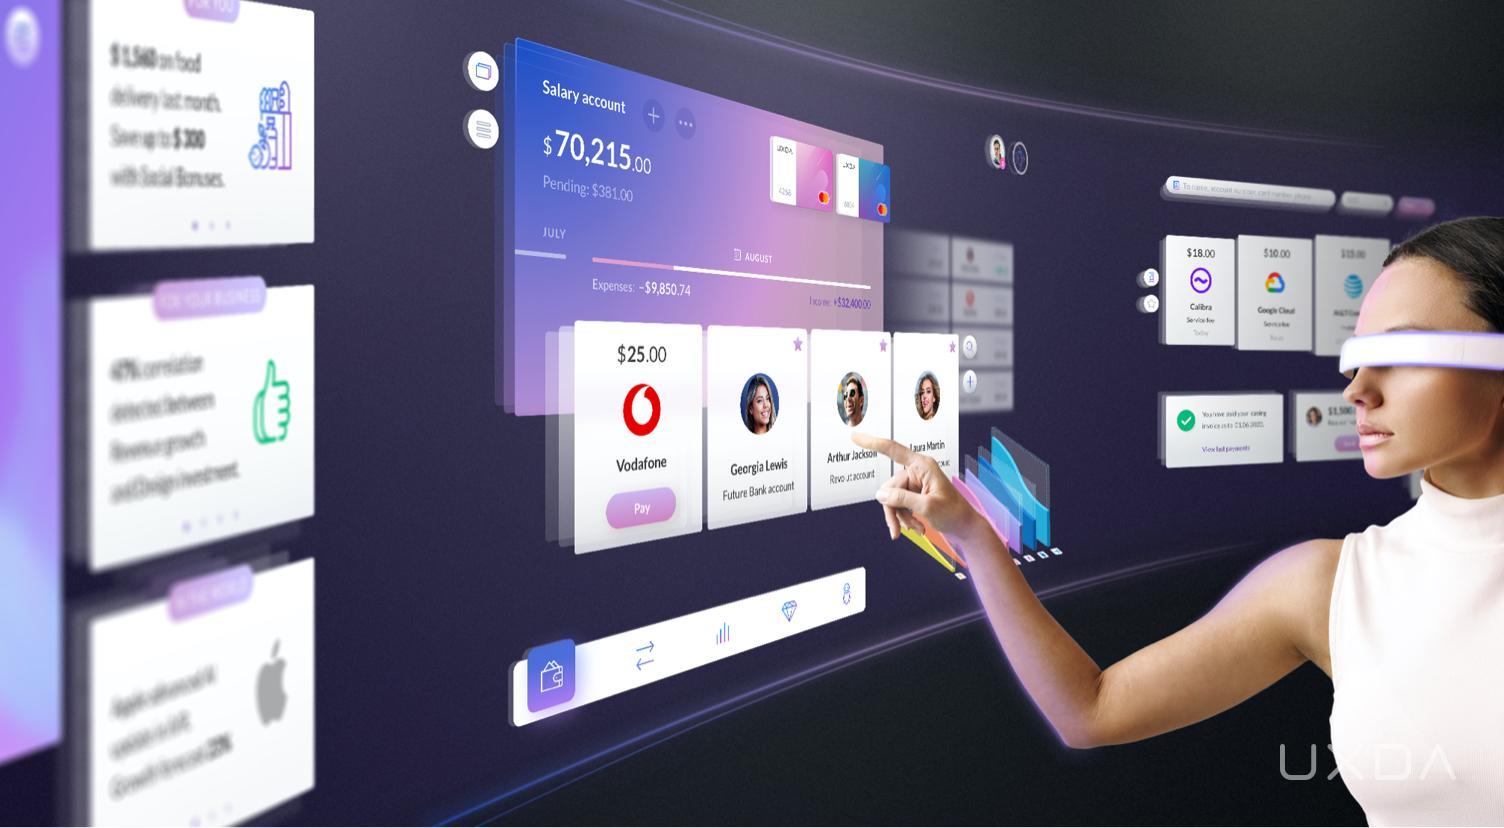 digital-banking-customer-experience-trends-1.jpg